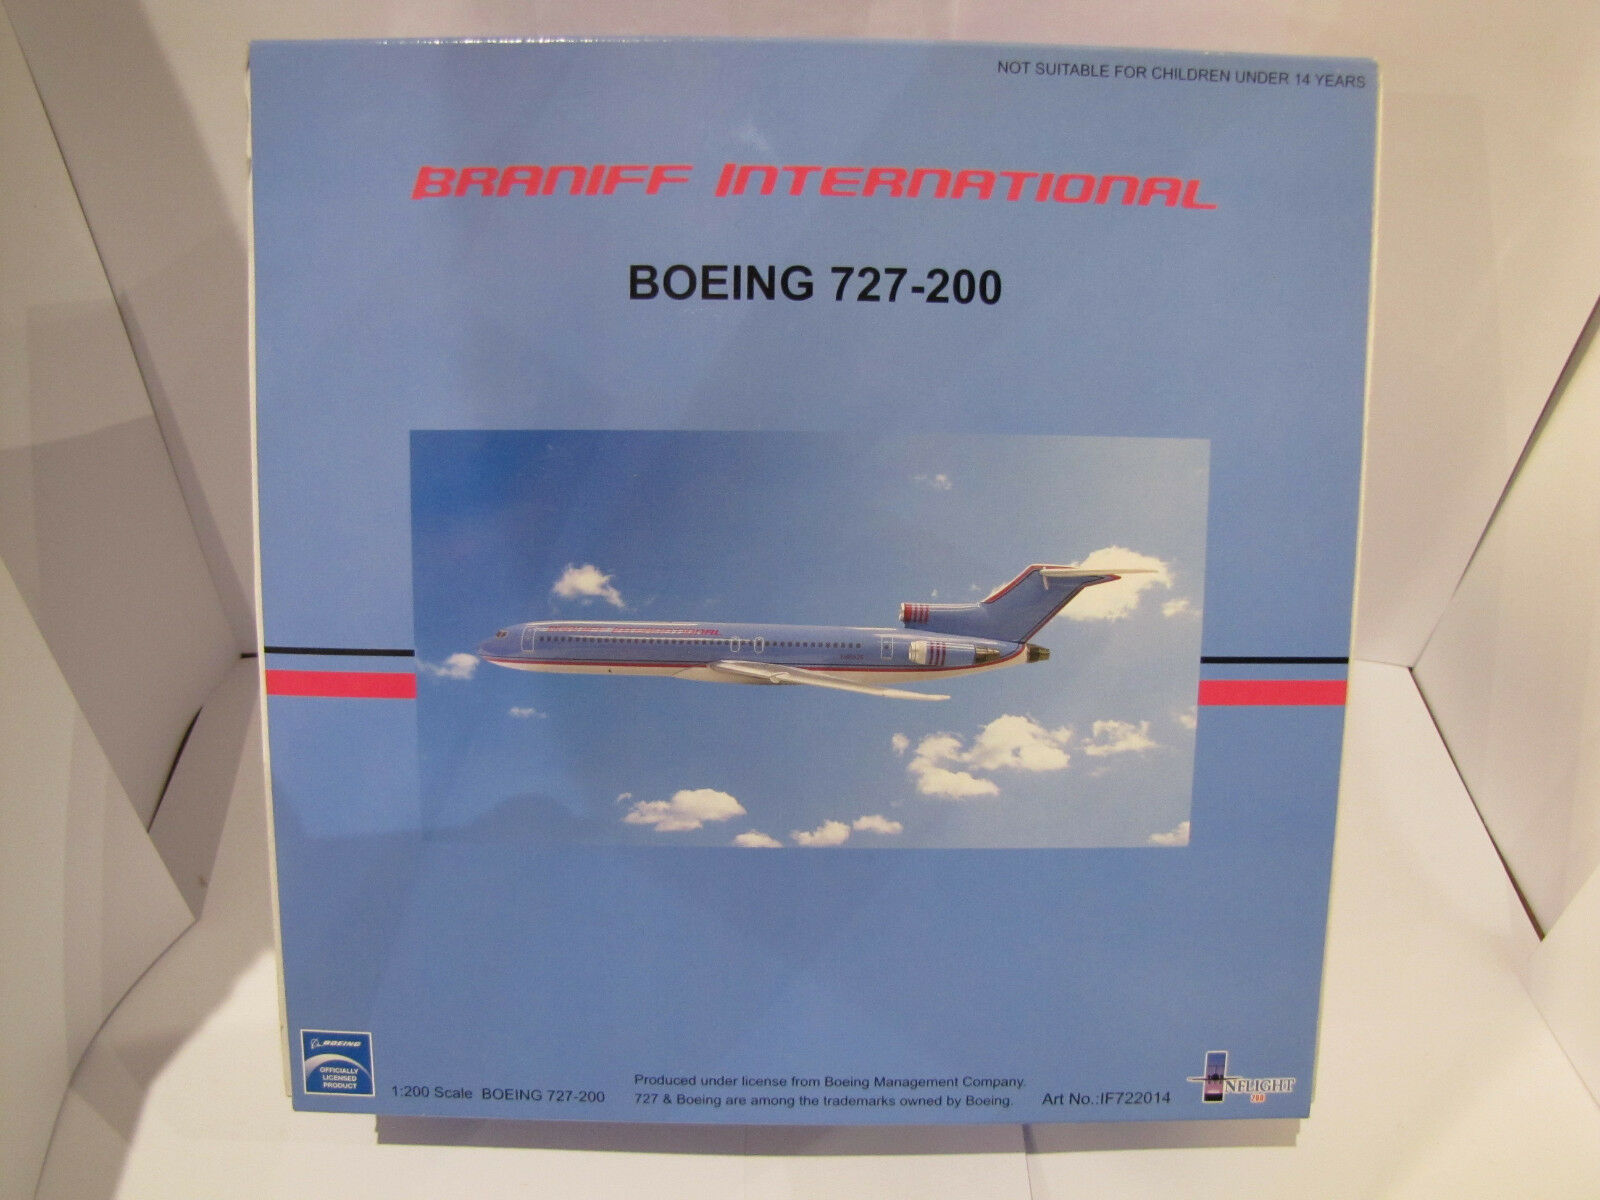 If722014-vol-Boeing 727-200 - Braniff International - 1 200